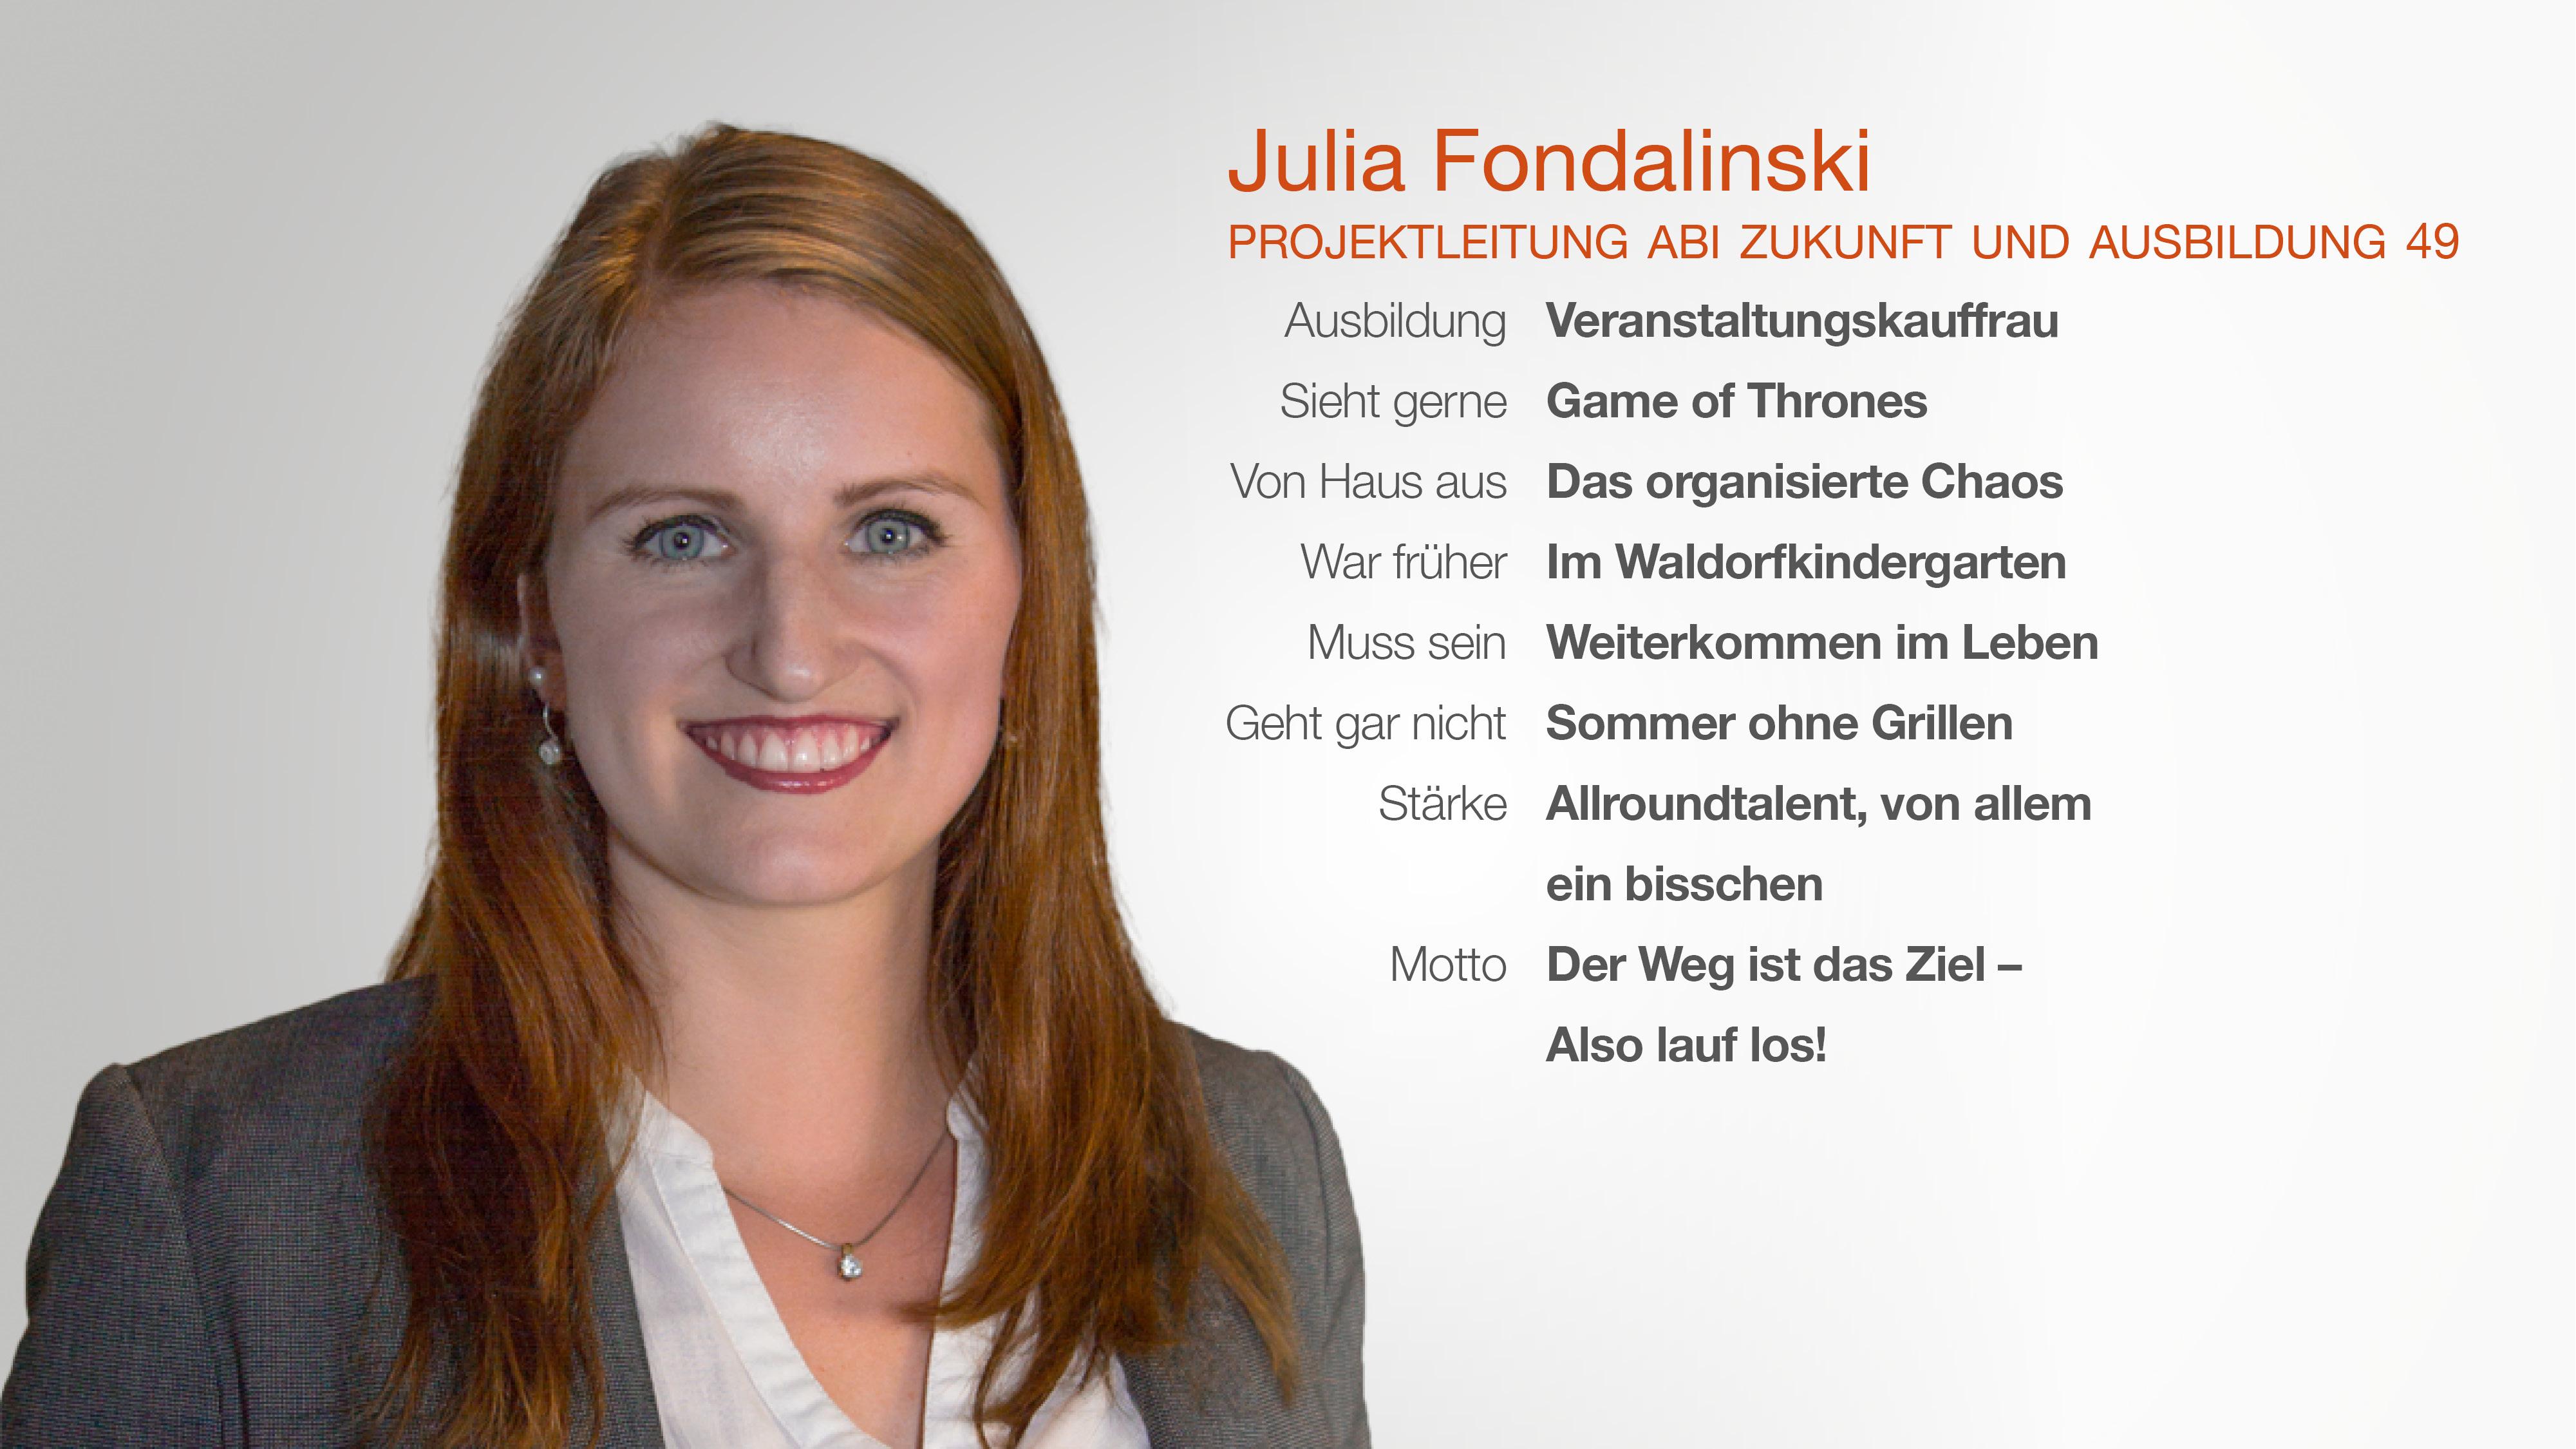 JF-Messekonzept-Homepageportraits-JuliaFondalinski